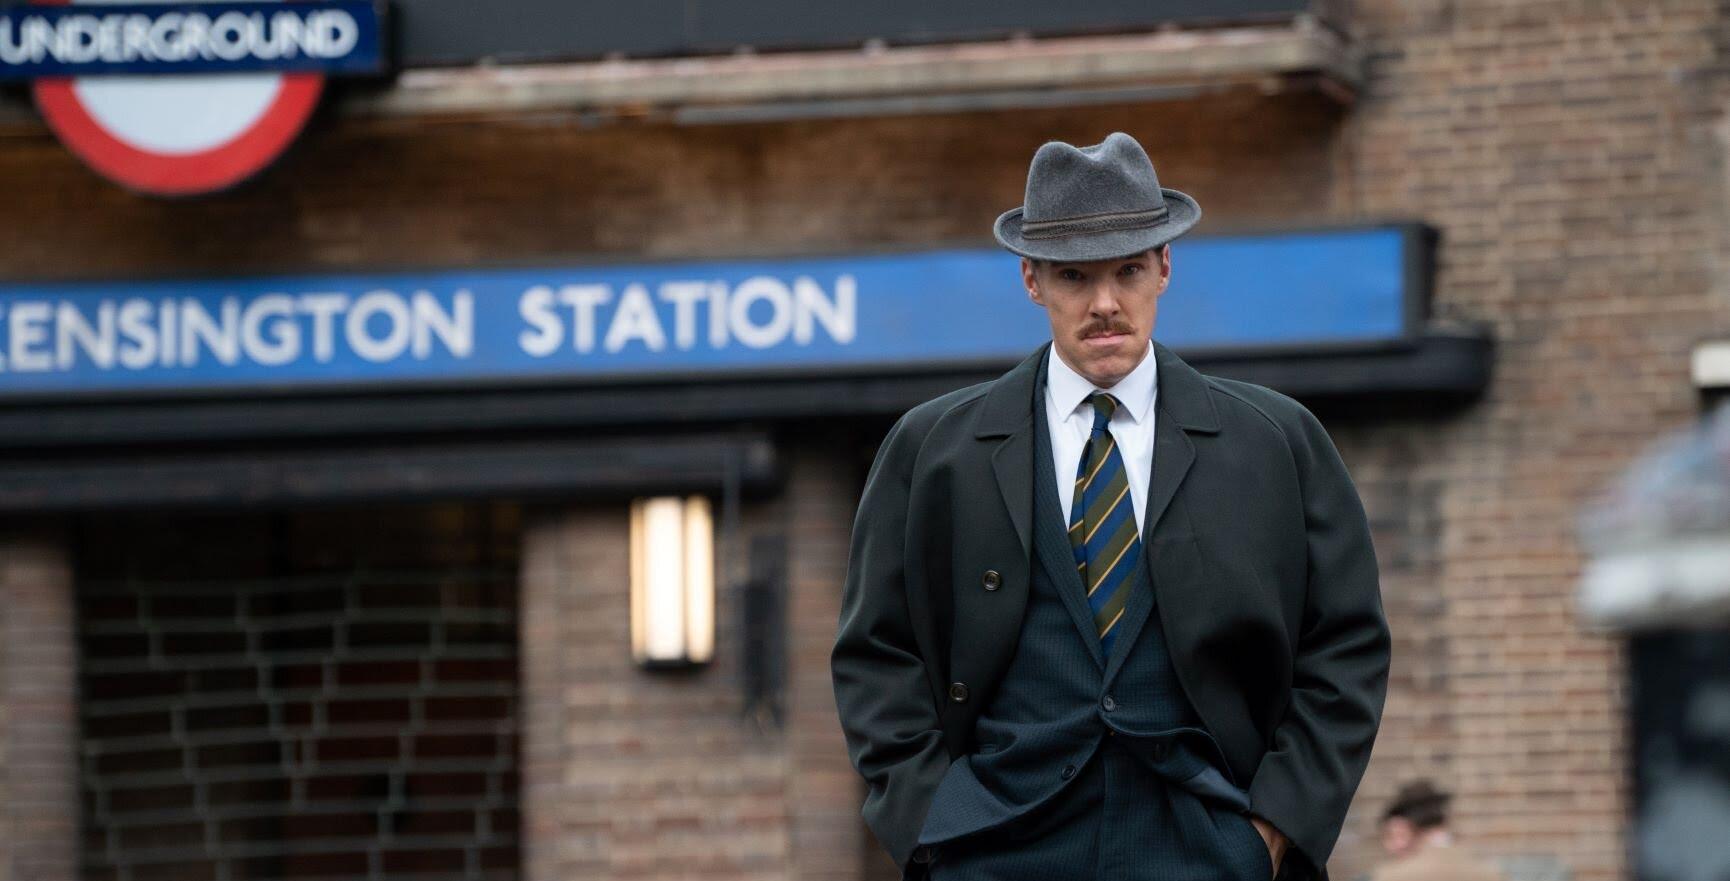 Benedict Cumberbatch in The Courier.